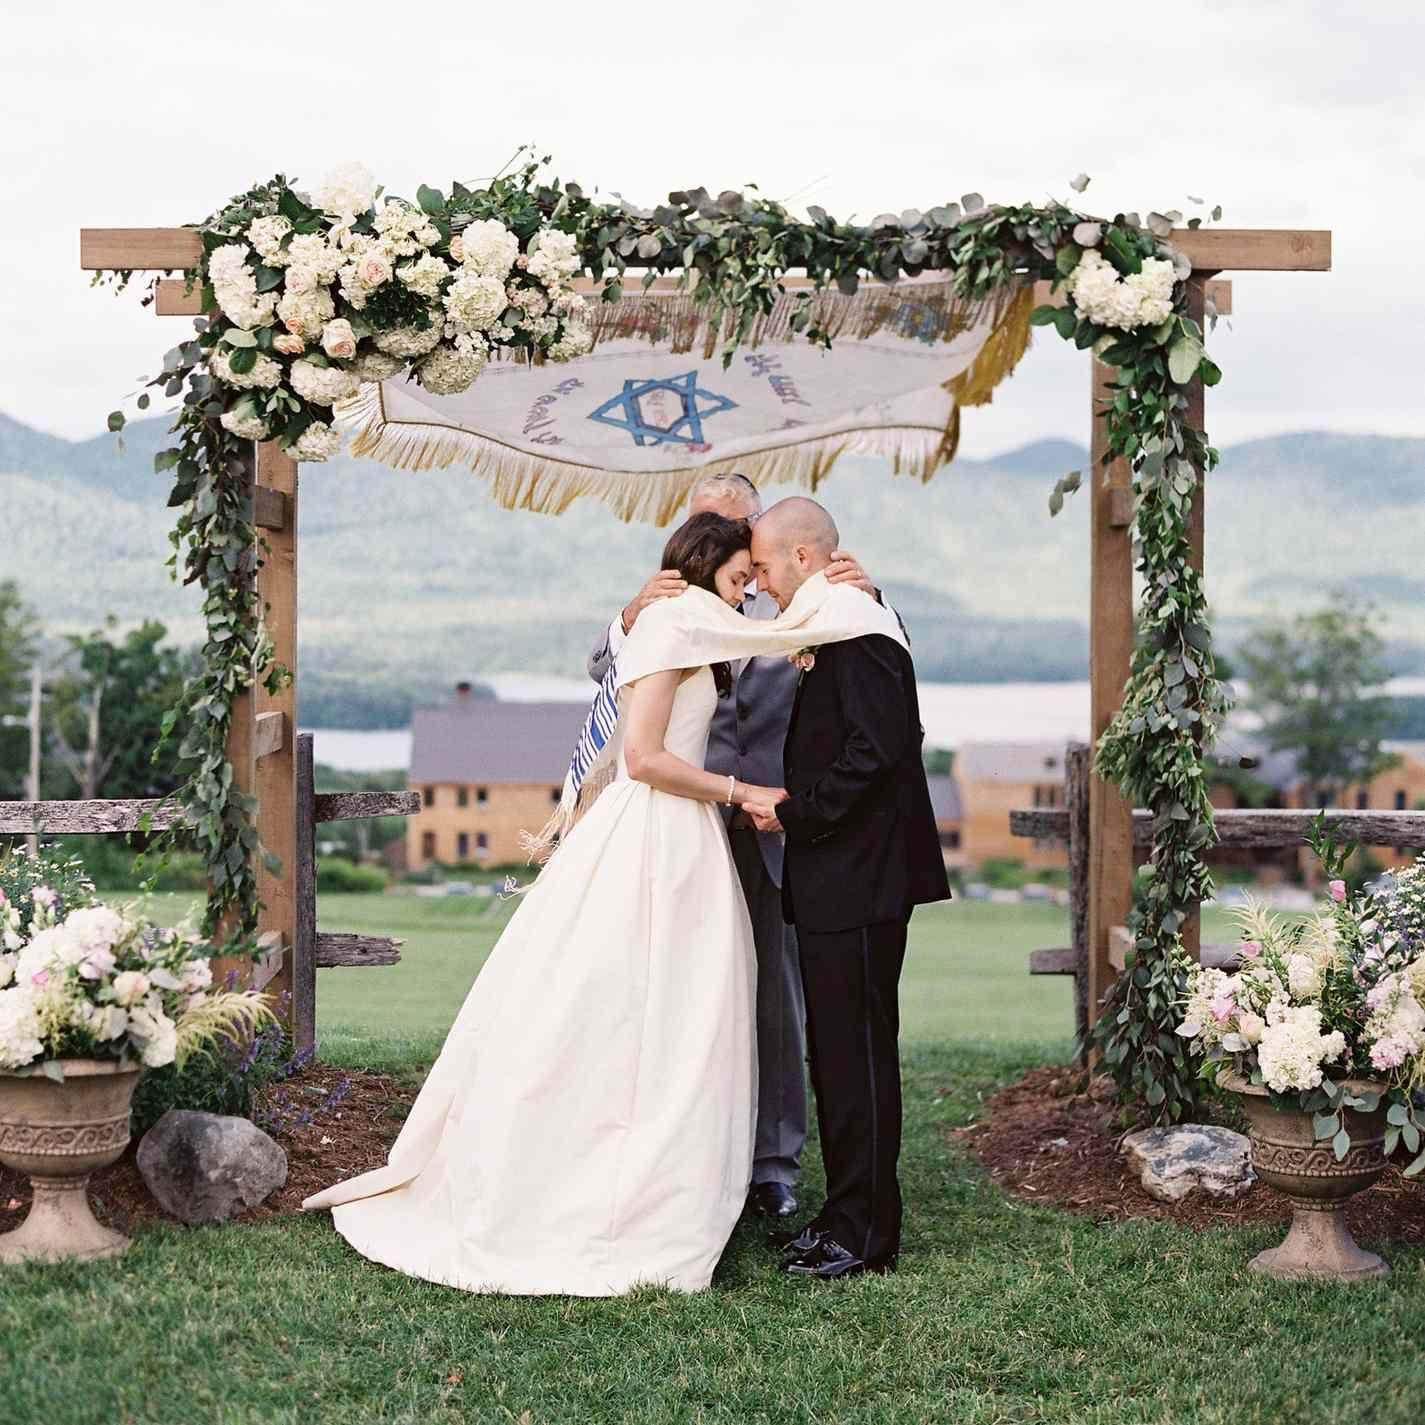 13 Jewish Wedding Traditions And Rituals You Need To Know In 2020 Jewish Wedding Traditions Jewish Wedding Jewish Wedding Chuppah